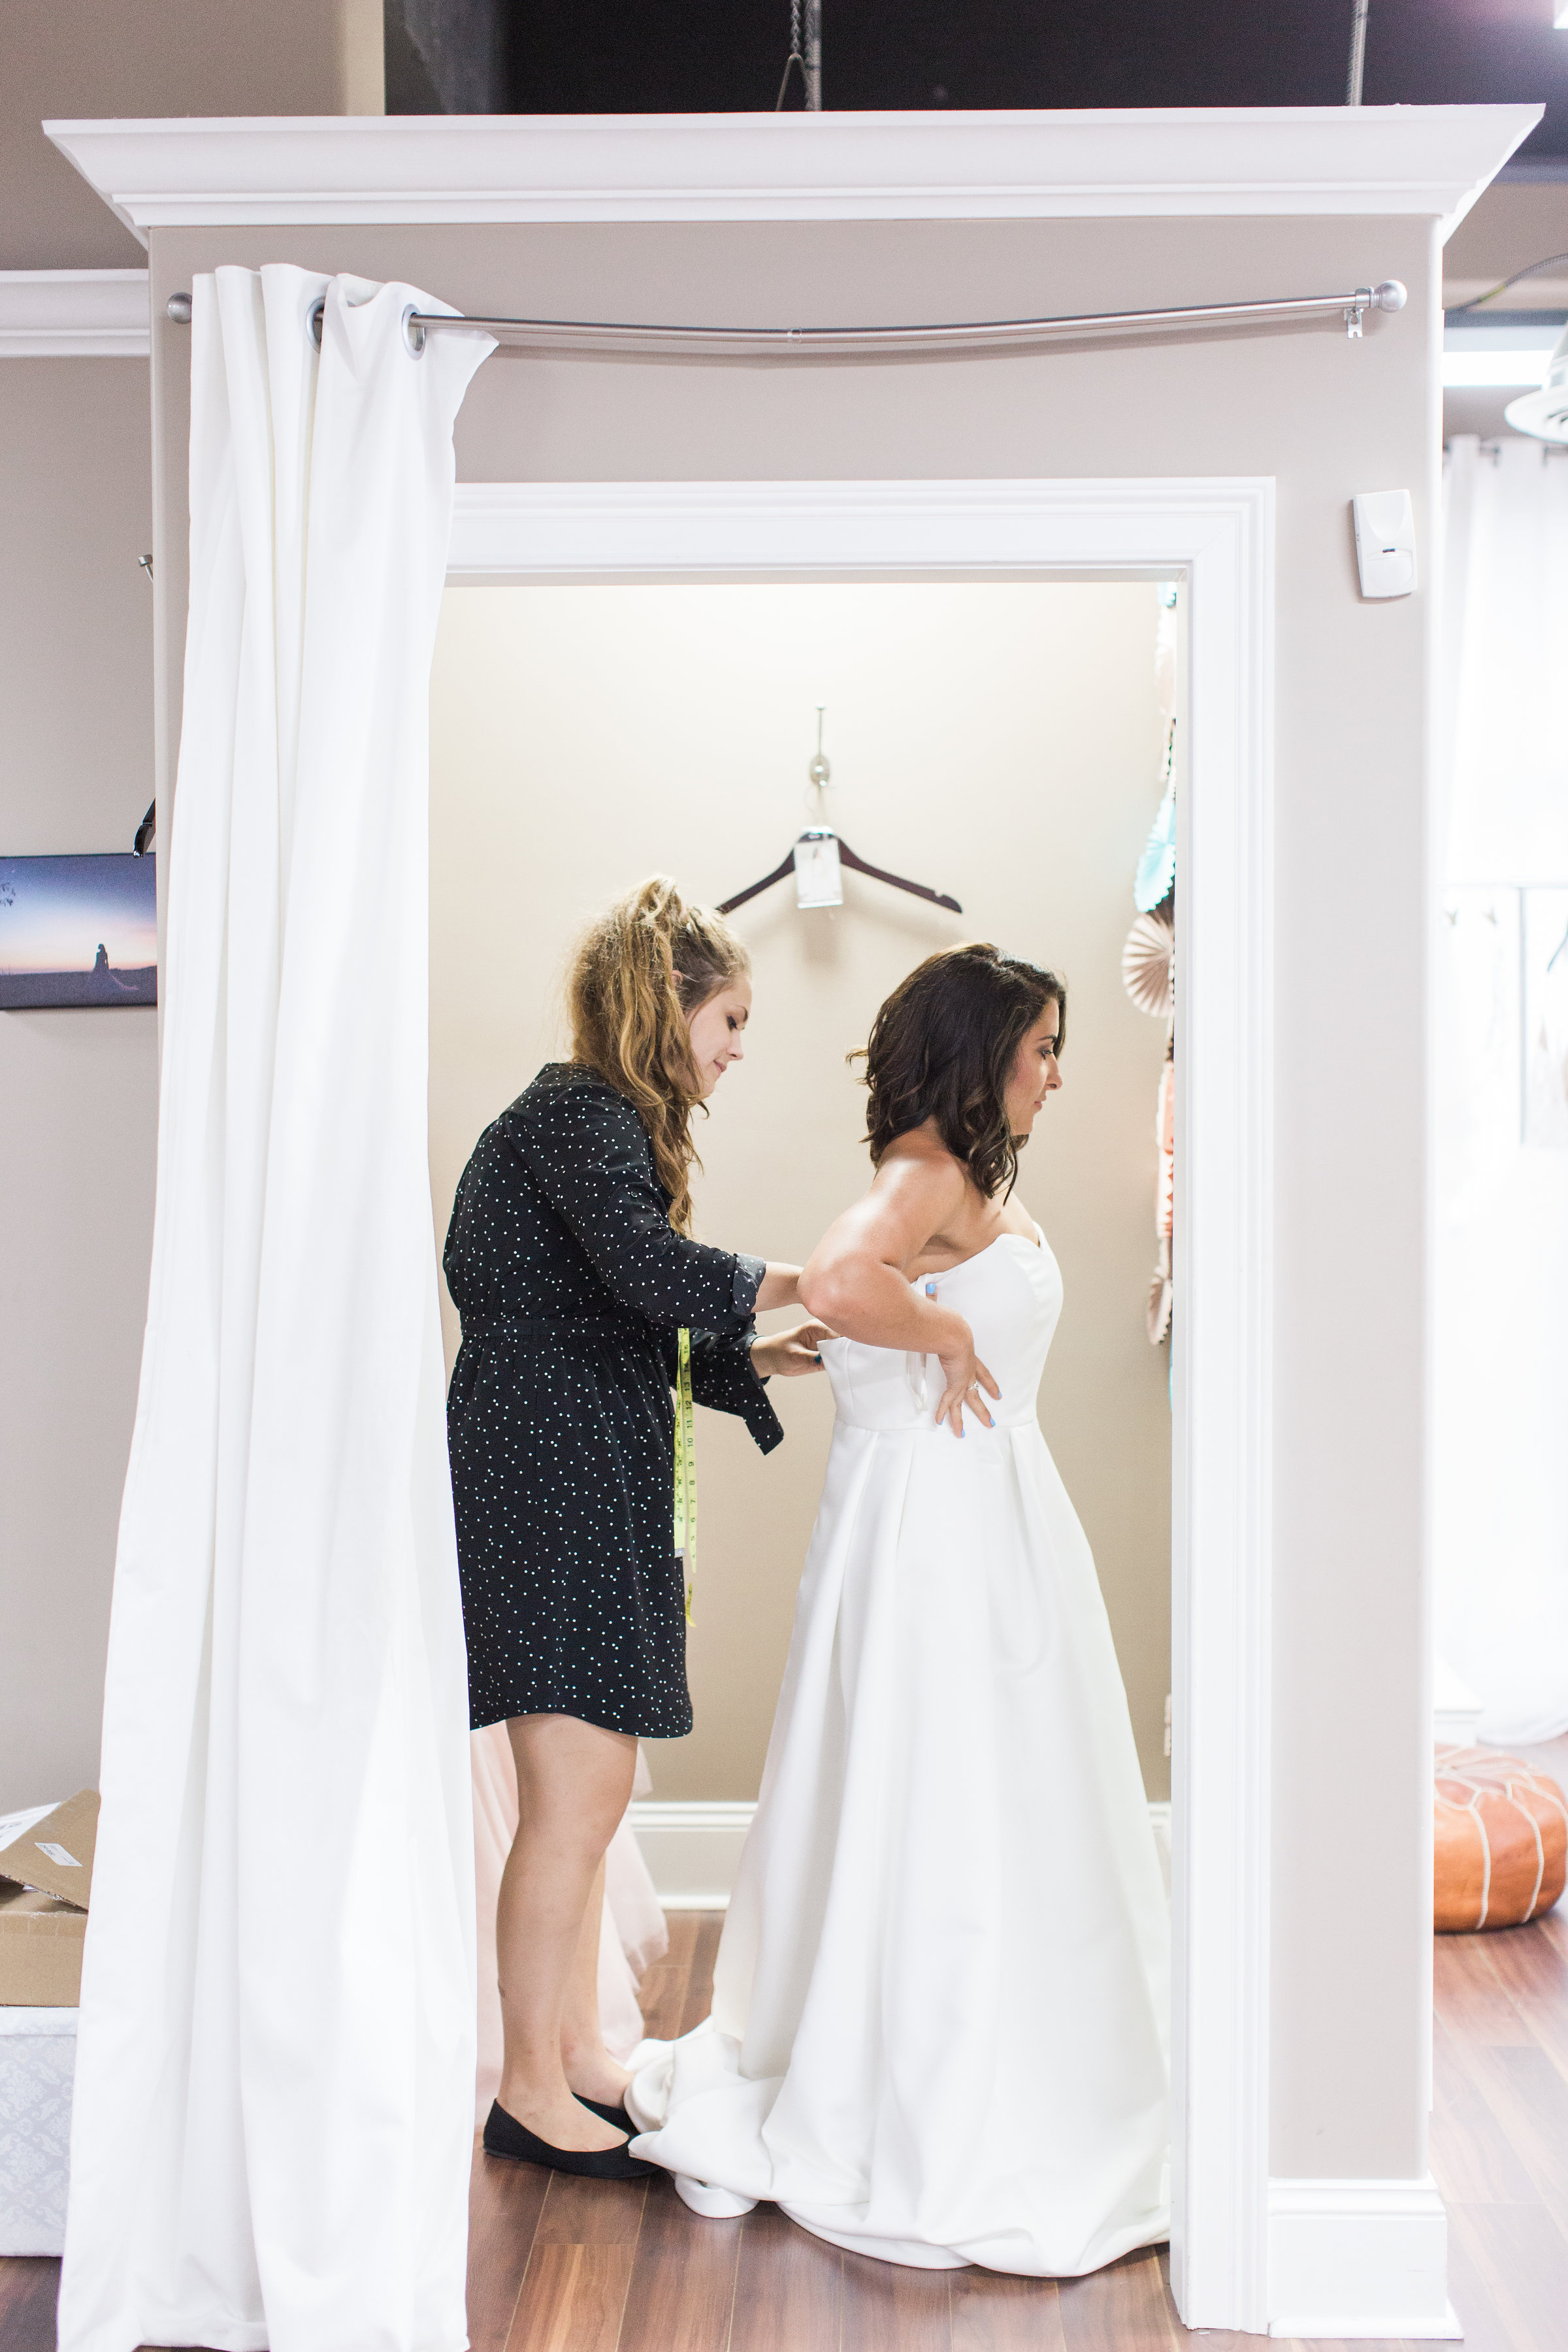 savannah-bridal-boutique-ivory-and-beau-savannah-bride-savannah-bridal-shop-wedding-dress-savannah-weddings-wedding-dress-savannah-aptbphotography-aptbphoto-veils-tiaras-bridal-jewelery-bridesmaids-dresses-bridesmaids-gowns-savannah-bridesmaids.jpg-59.jpg